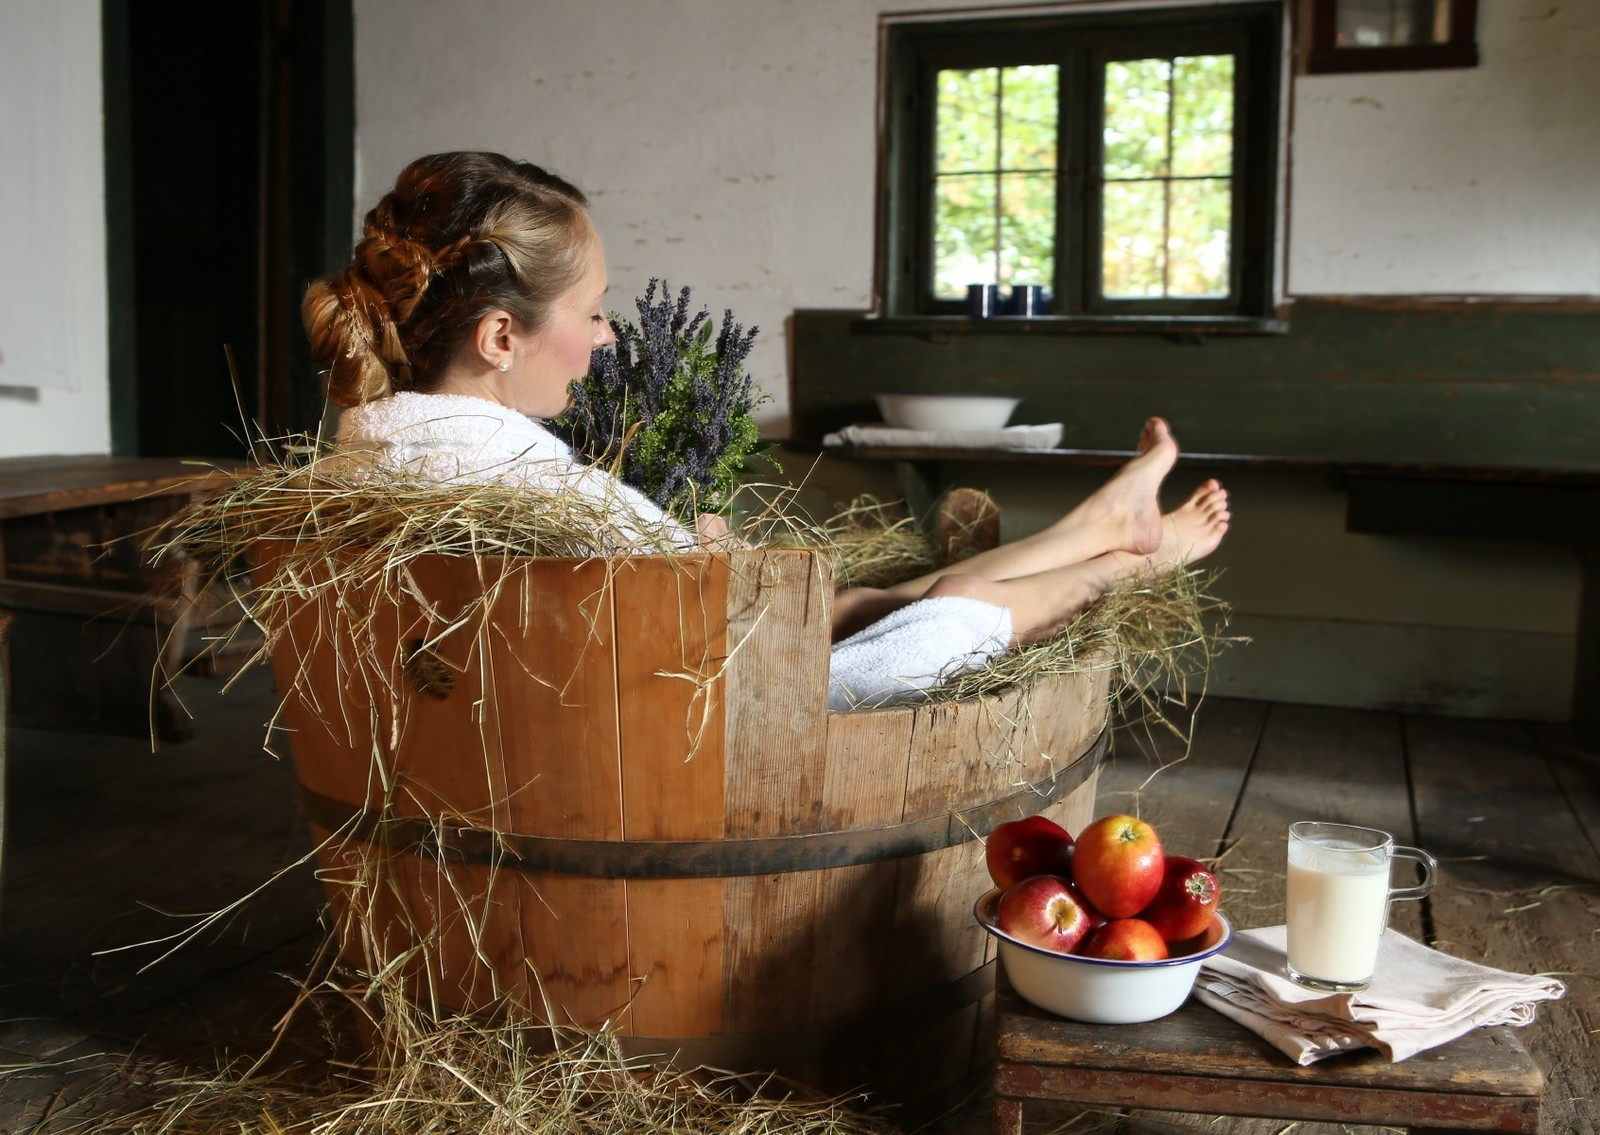 badewanne-heu-apfel-gesundheit-wellness-1692x1200.jpg